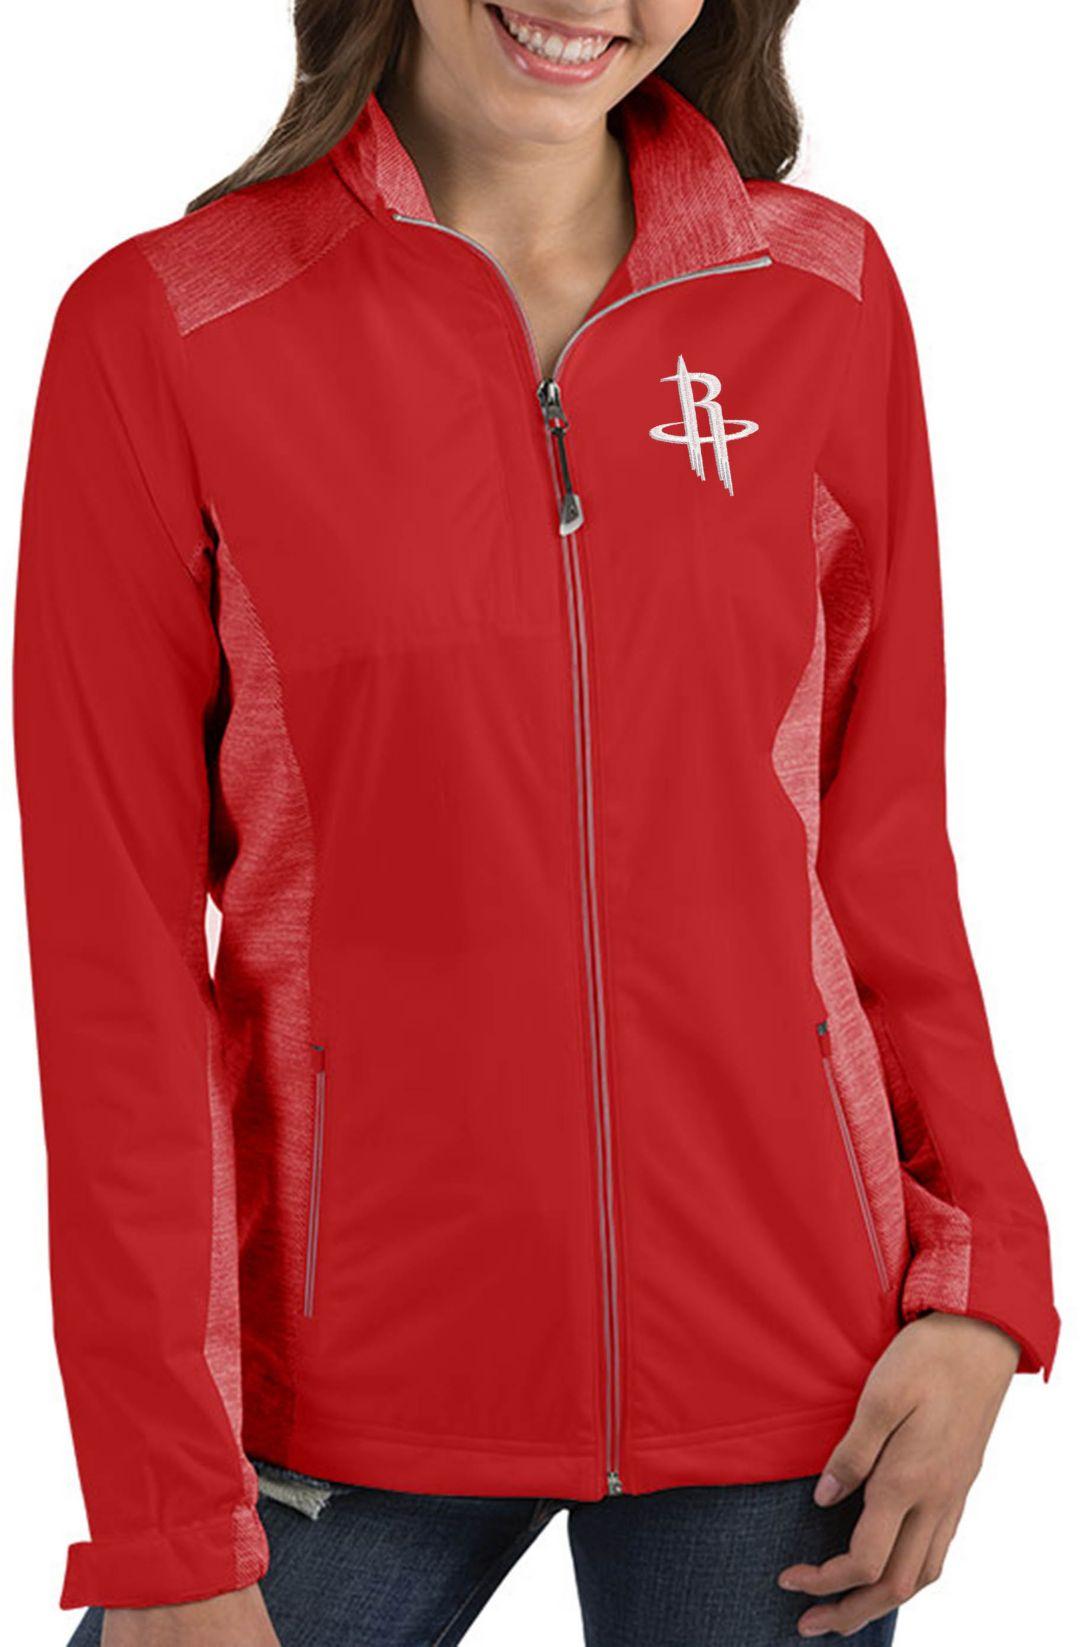 new product 7e535 6d73a Antigua Women s Houston Rockets Revolve Full-Zip Jacket. noImageFound. 1